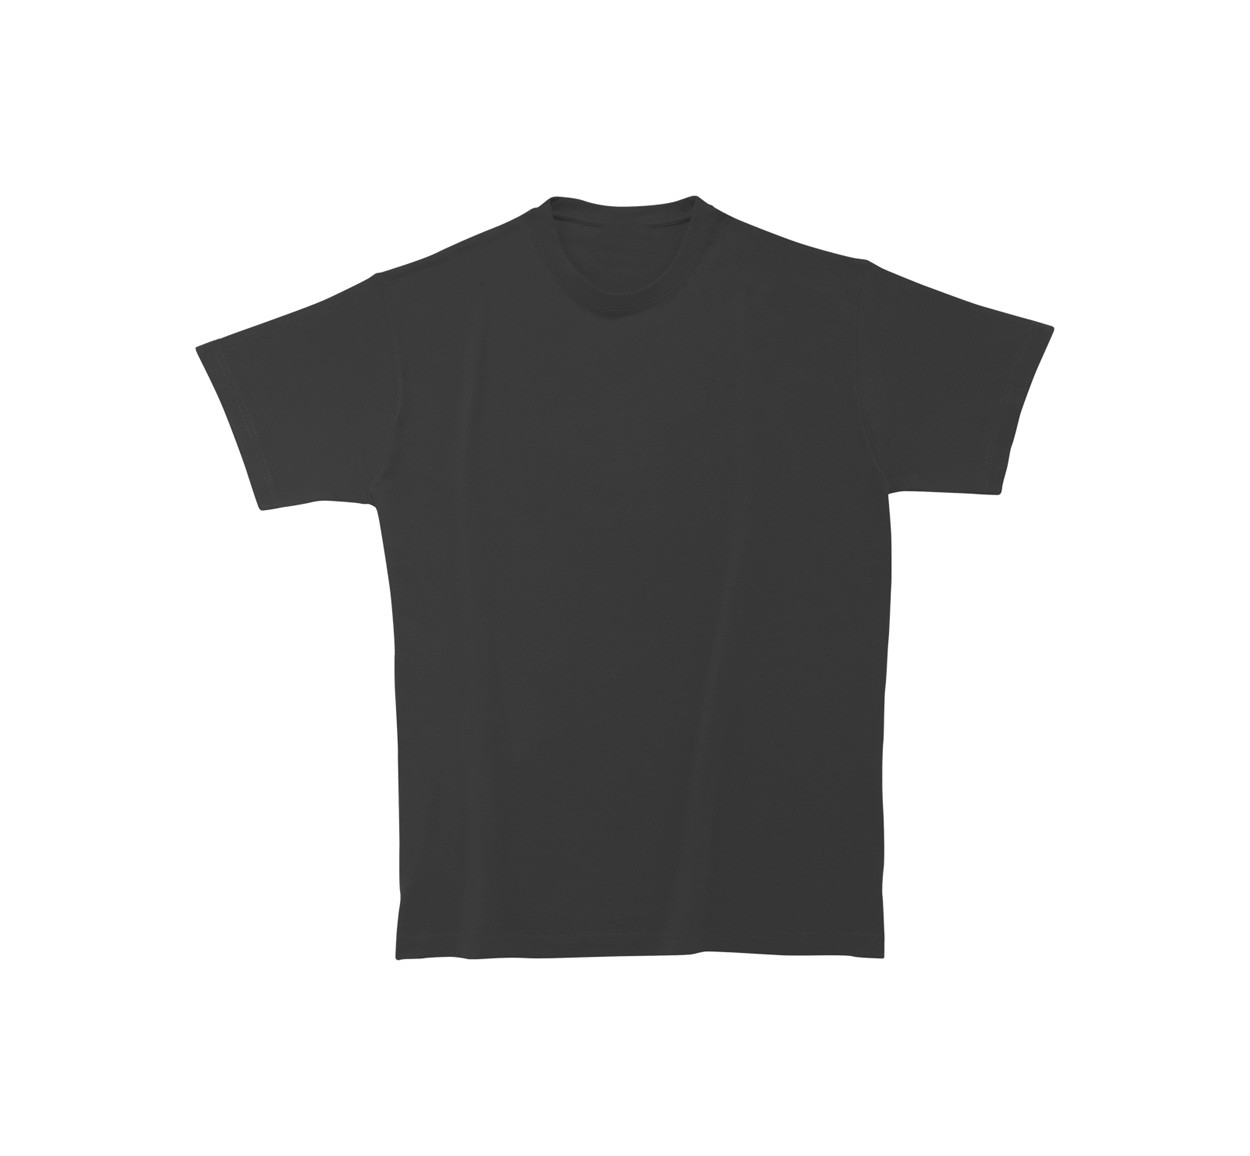 T-Shirt Heavy Cotton - Black / XXL